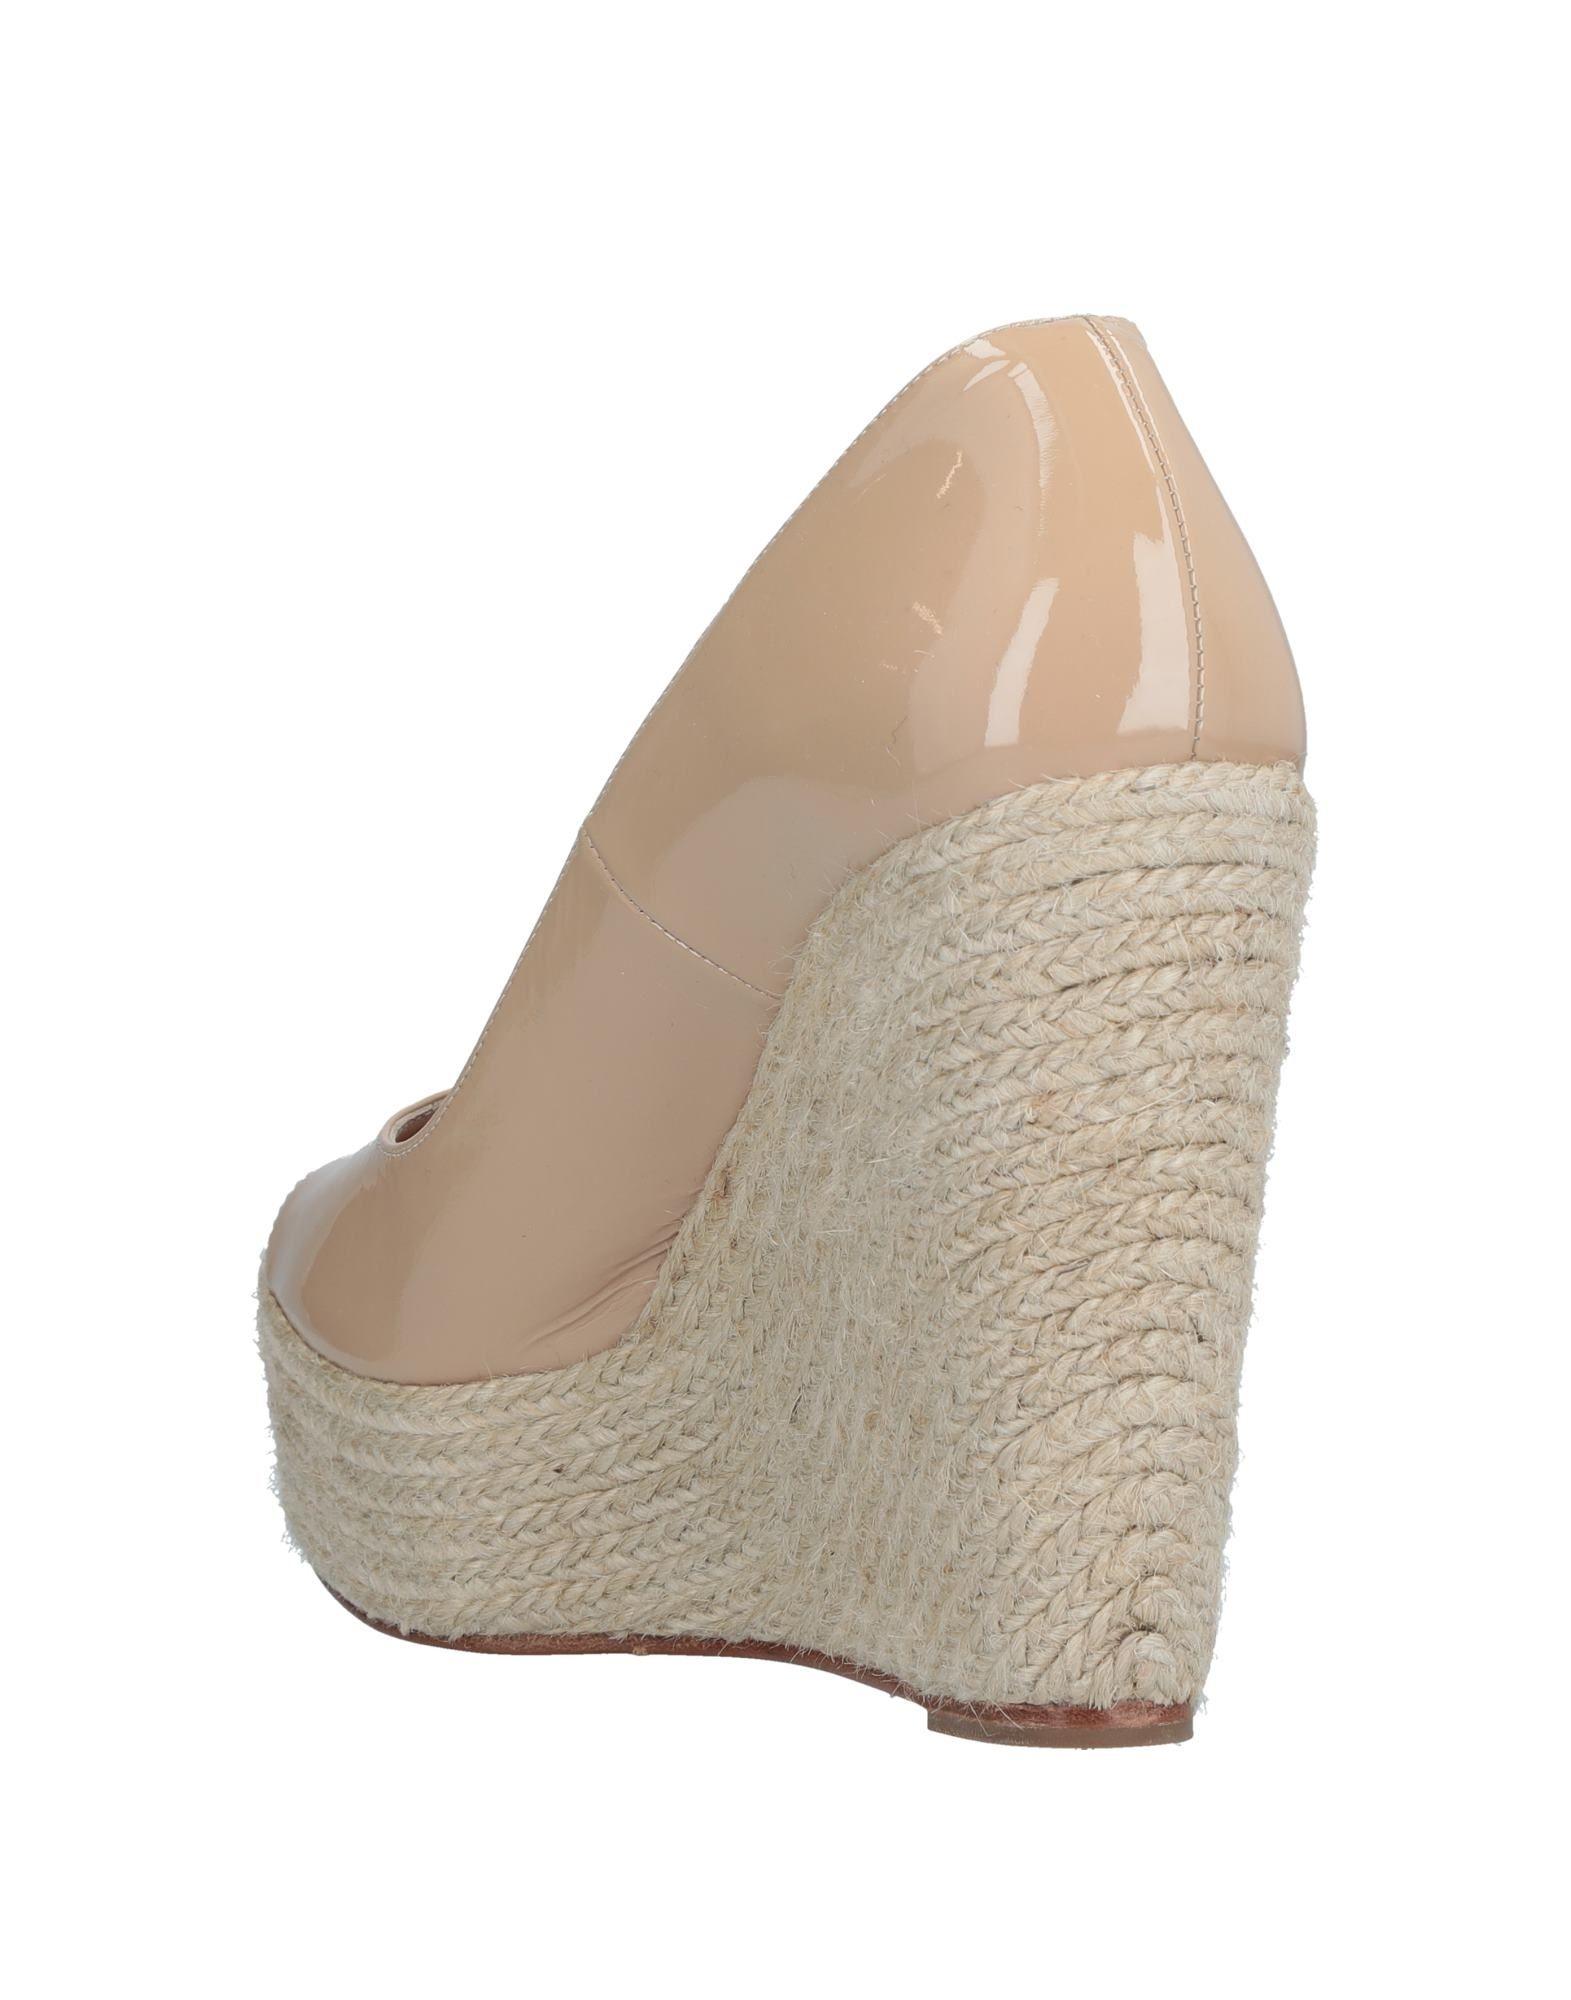 Gut um billige Schuhe  zu tragenPaloma Barceló Espadrilles Damen  Schuhe 11538270SK 338bea